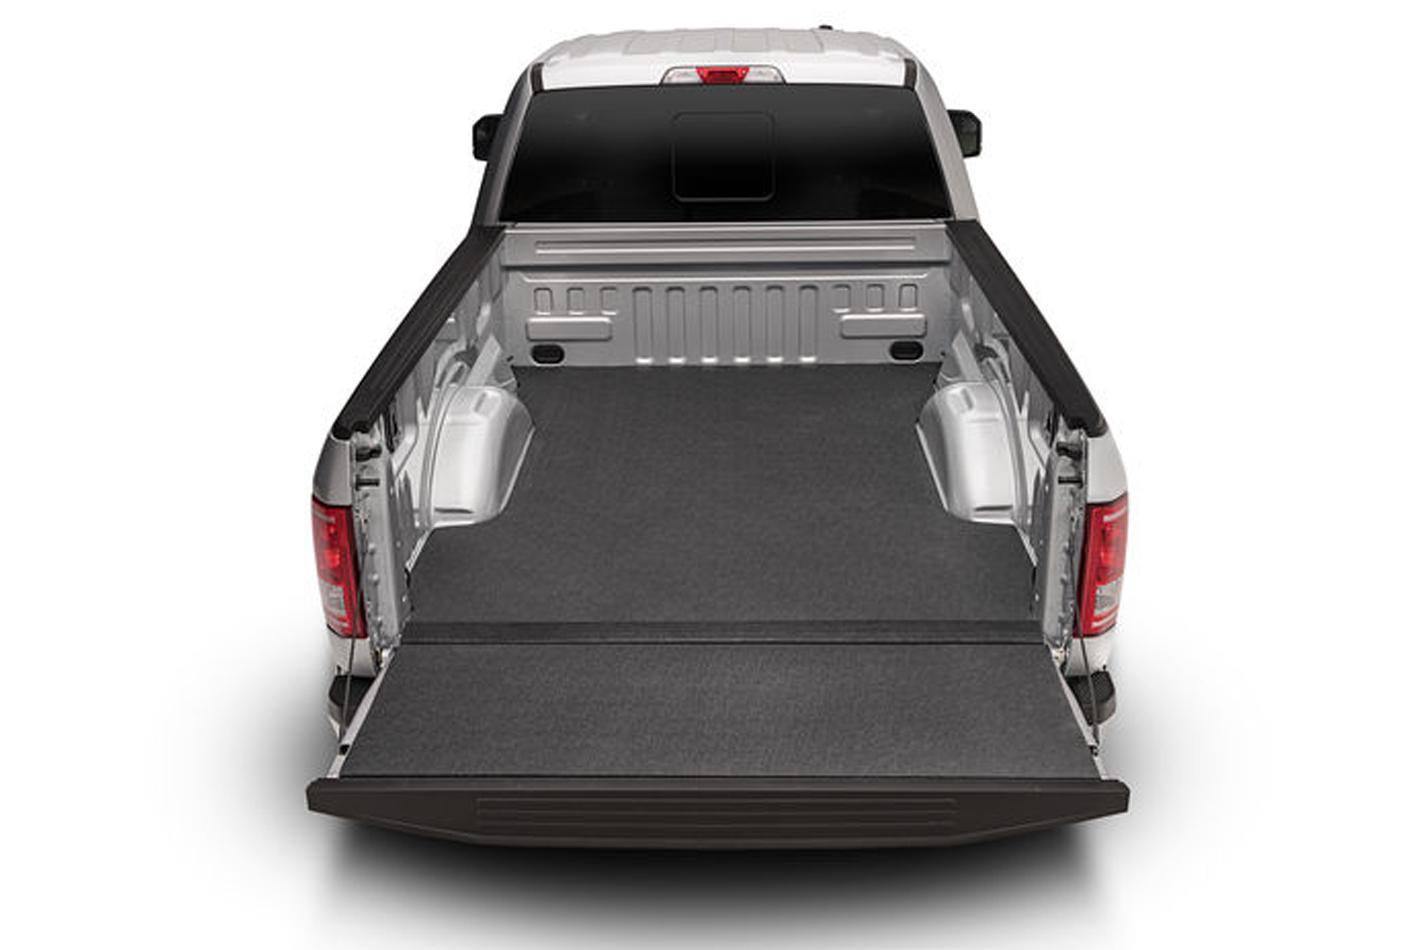 Bedrug Impact Bedliner 19- Dodge Ram 1500